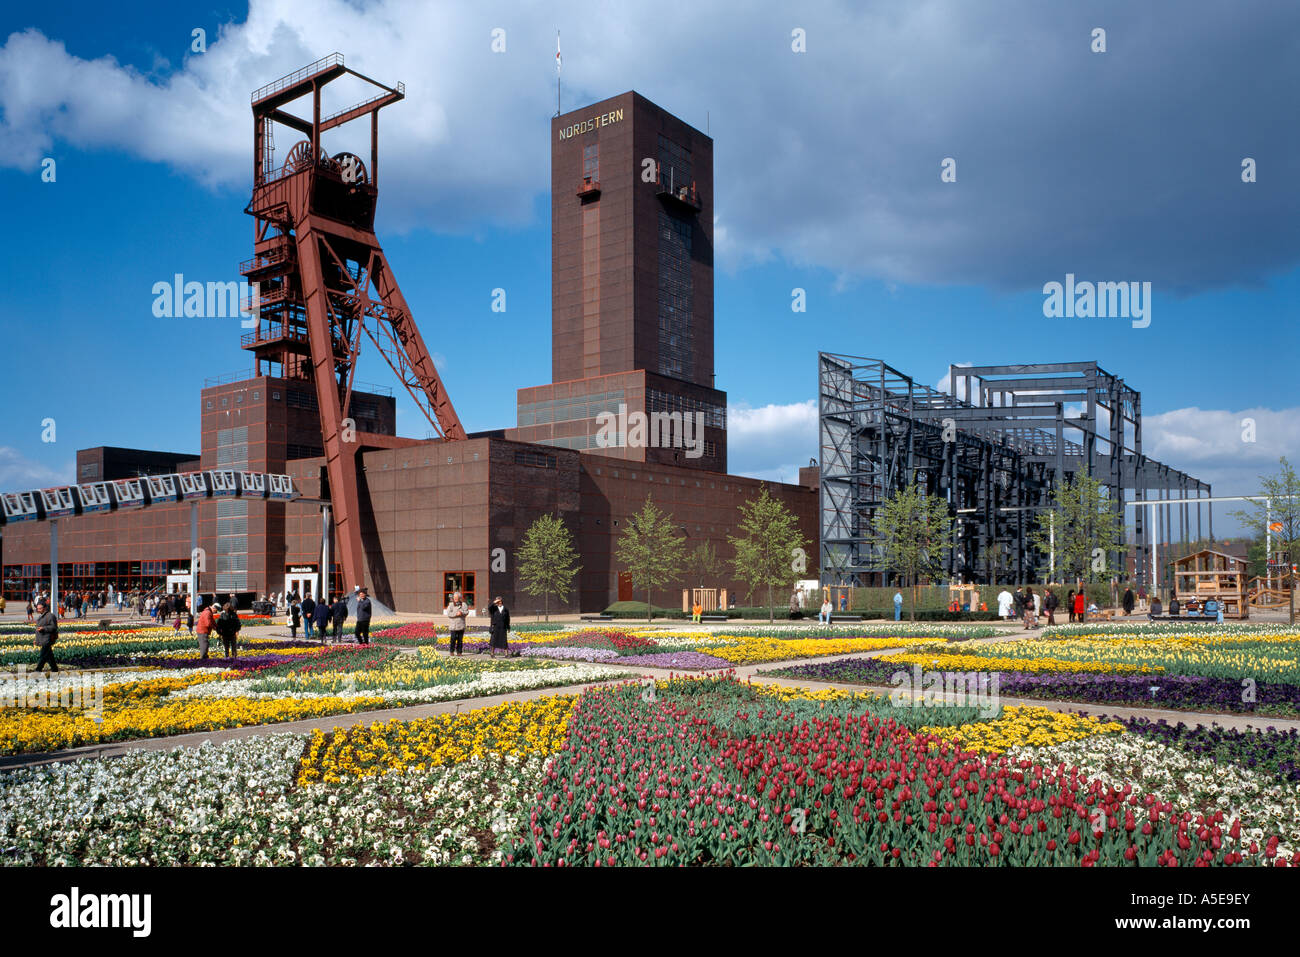 Gelsenkirchen, ehemalige Zeche Nordstern, BUGA 97, Fördertürme und Fassade des Kesselhauses Stock Photo